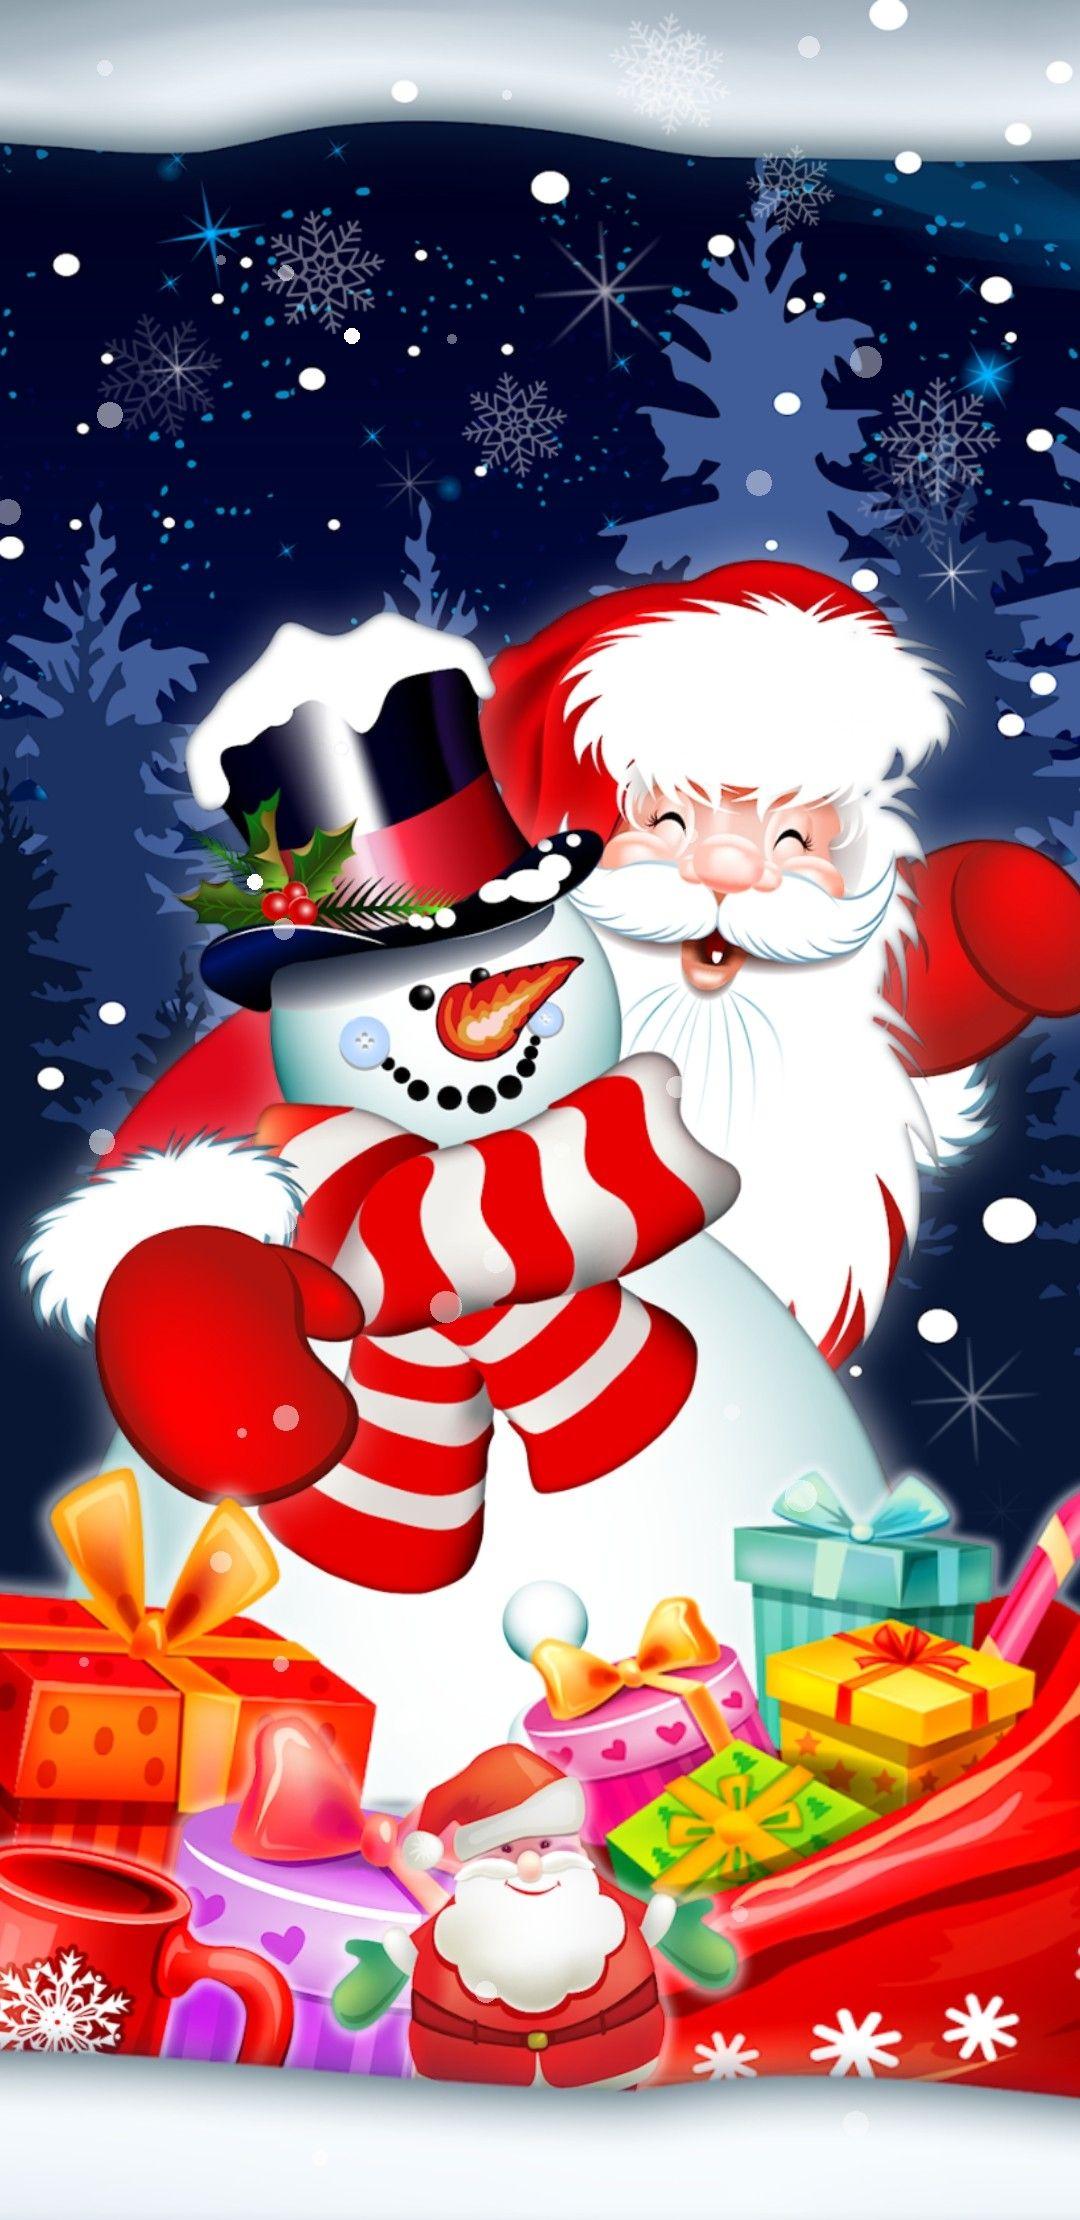 Santa Claus Thanksgiving Wallpaper Christmas Wallpaper